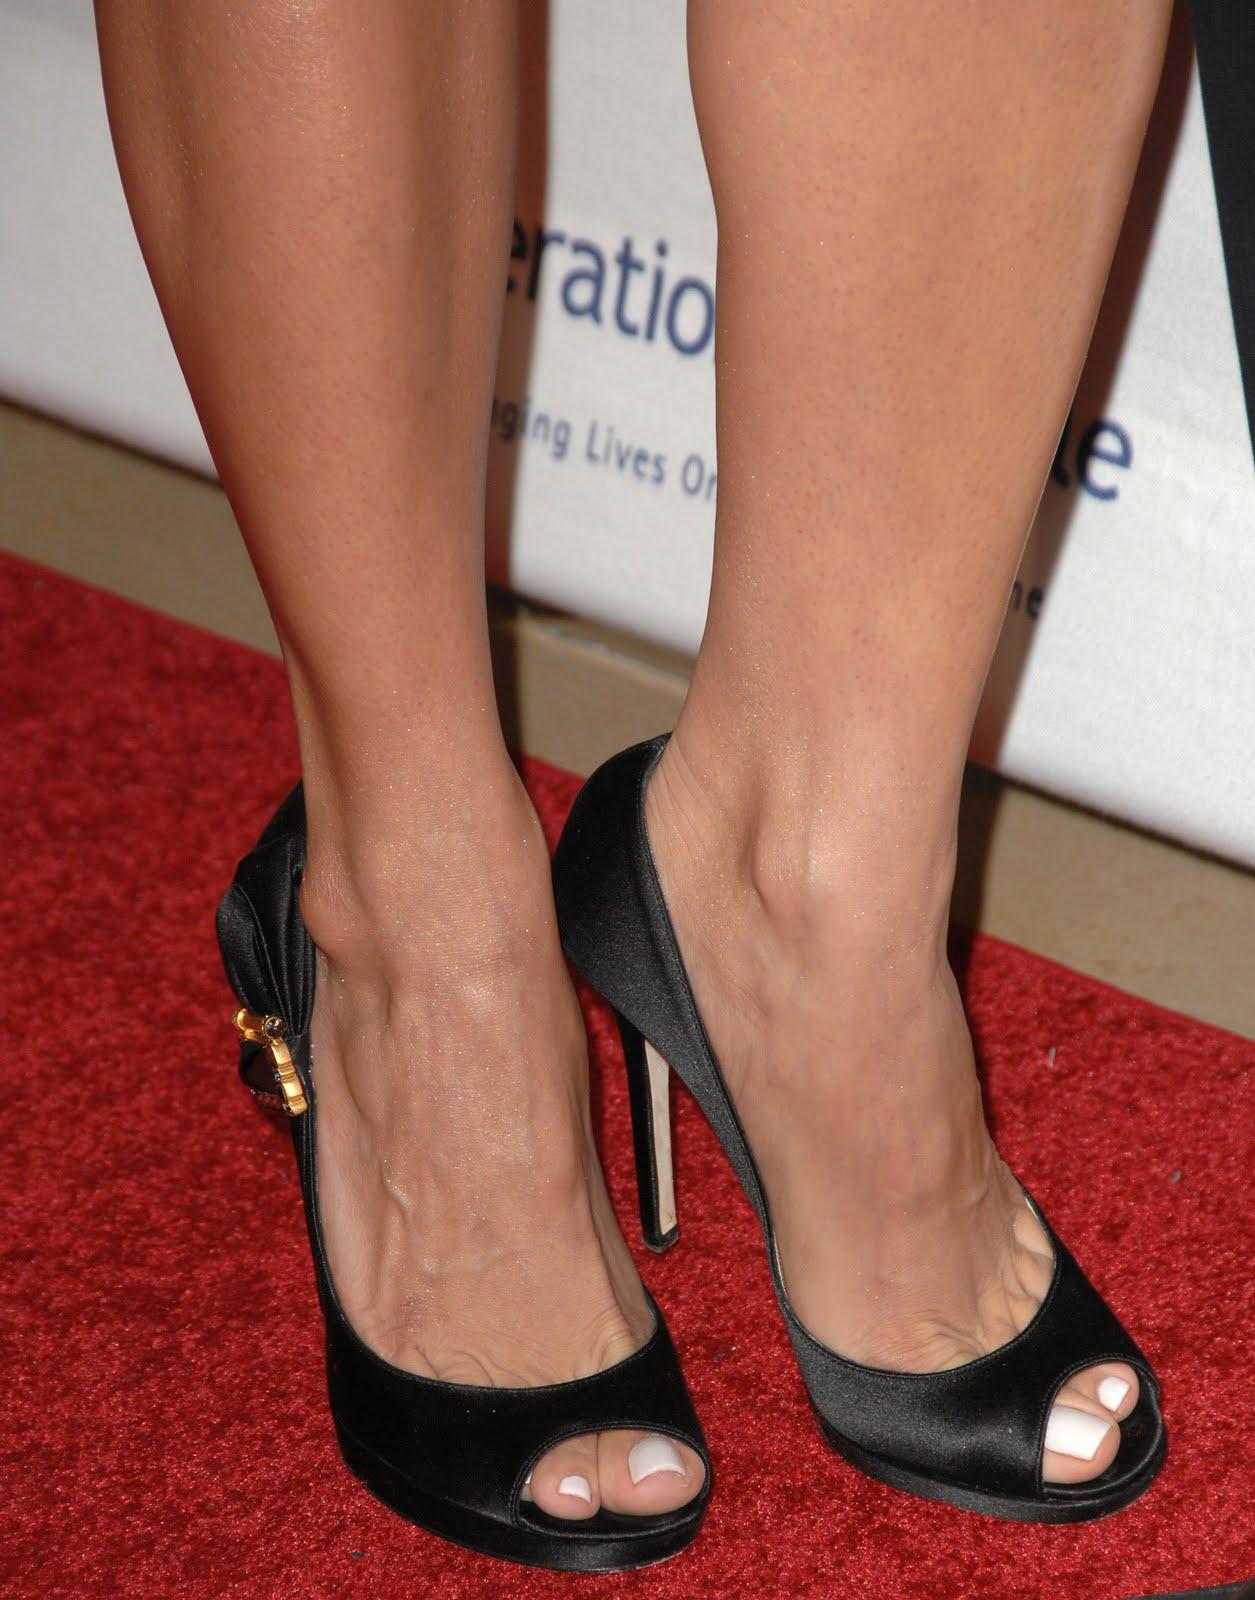 http://1.bp.blogspot.com/_UaLWp72nij4/TDep4FAvmnI/AAAAAAAAQ2w/pNOJo7tw-2I/s1600/roselyn-sanchez-feet-2.jpg